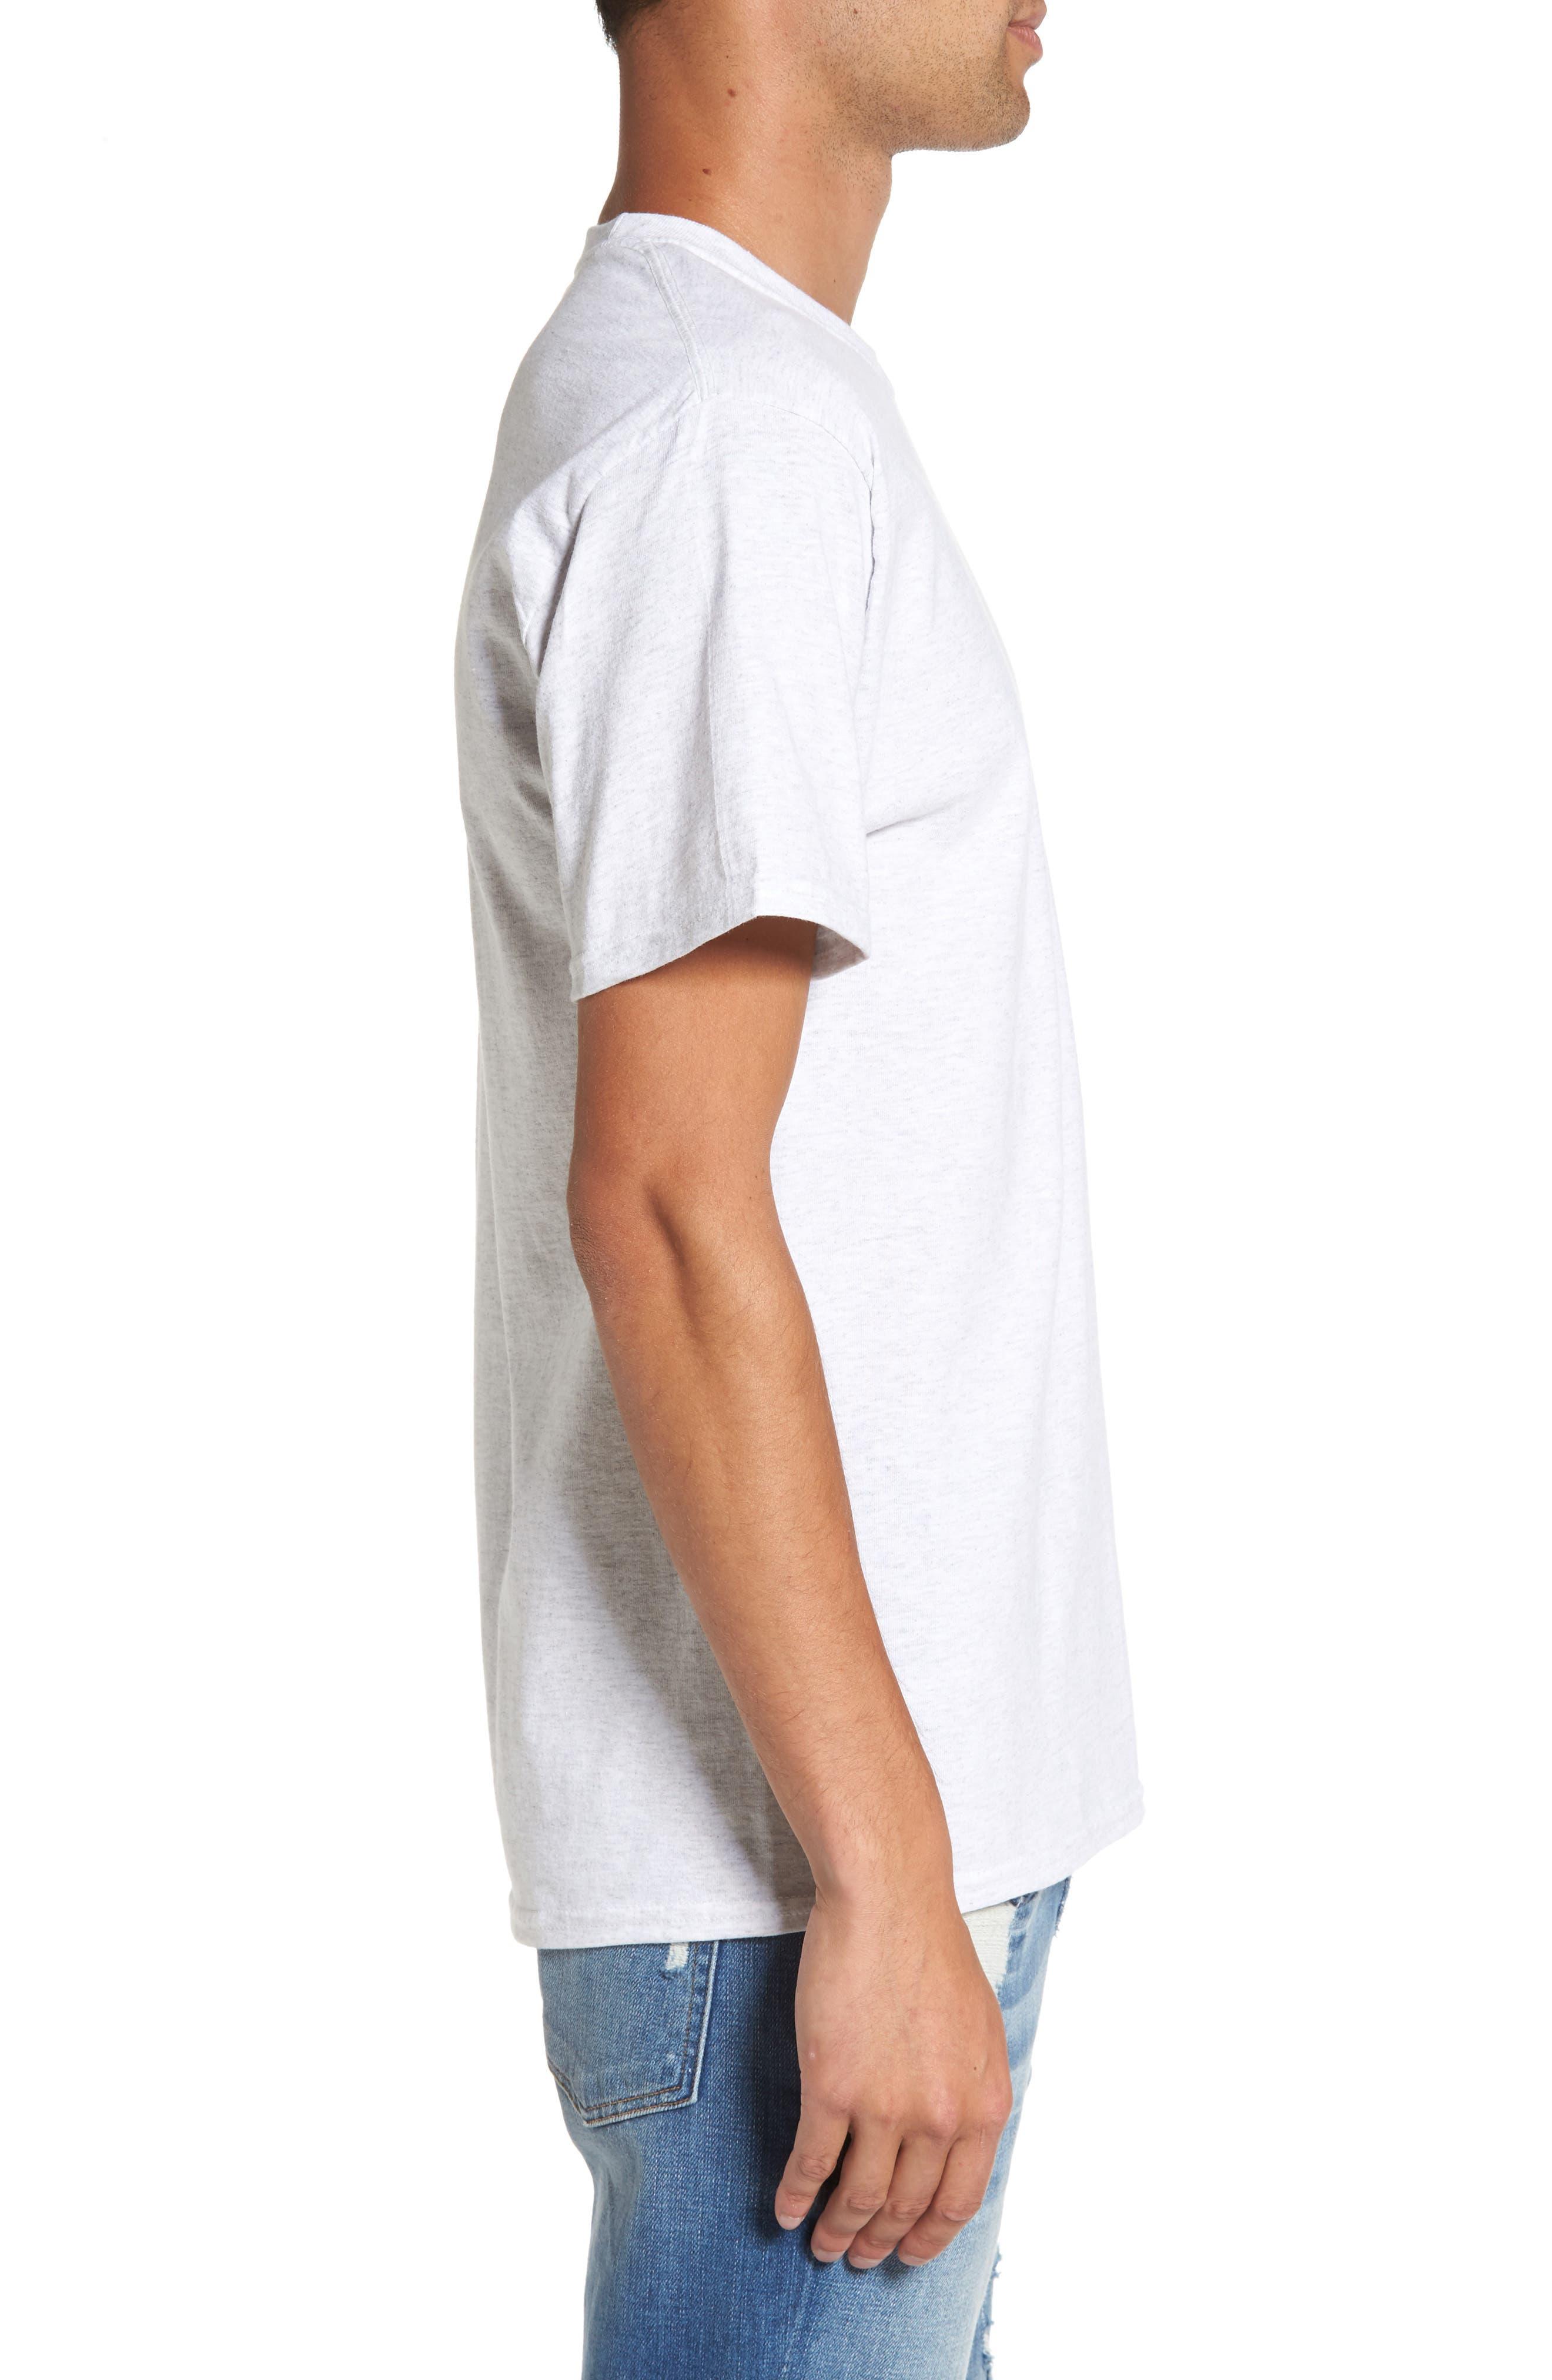 NIKBEN Egg T-Shirt,                             Alternate thumbnail 4, color,                             020